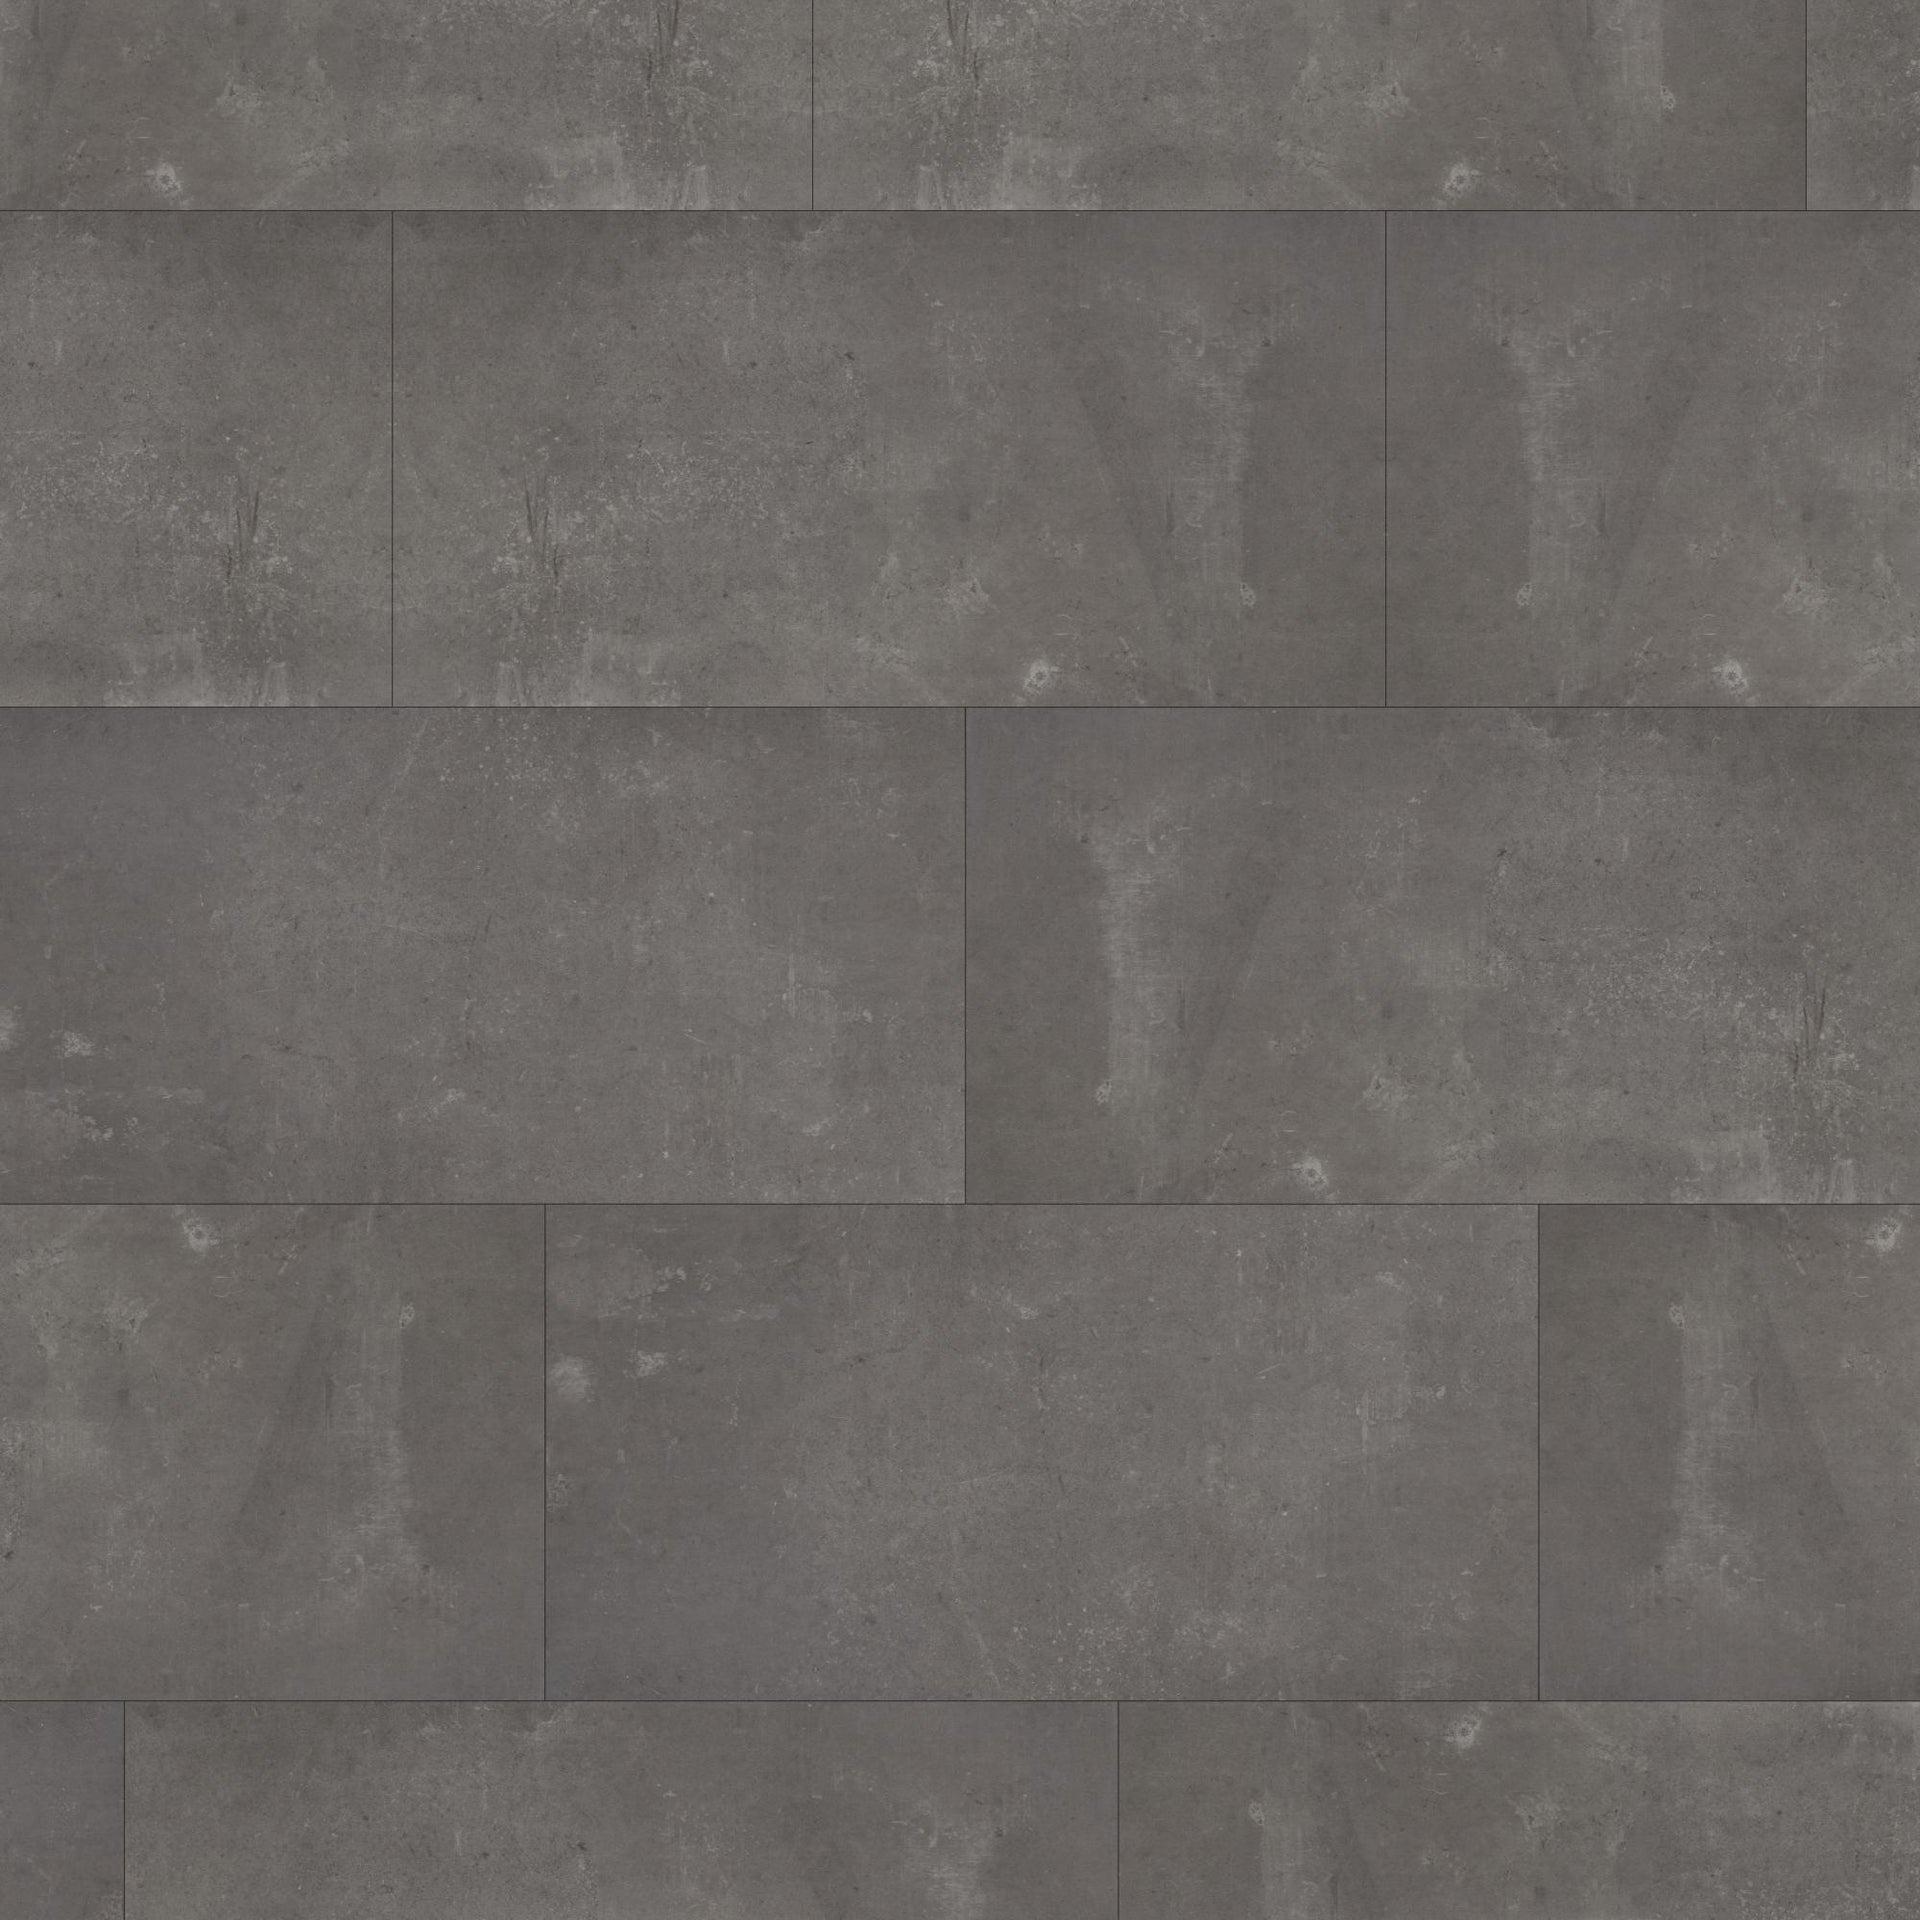 Pavimento PVC flottante clic+ Juke Sp 5 mm grigio / argento - 2